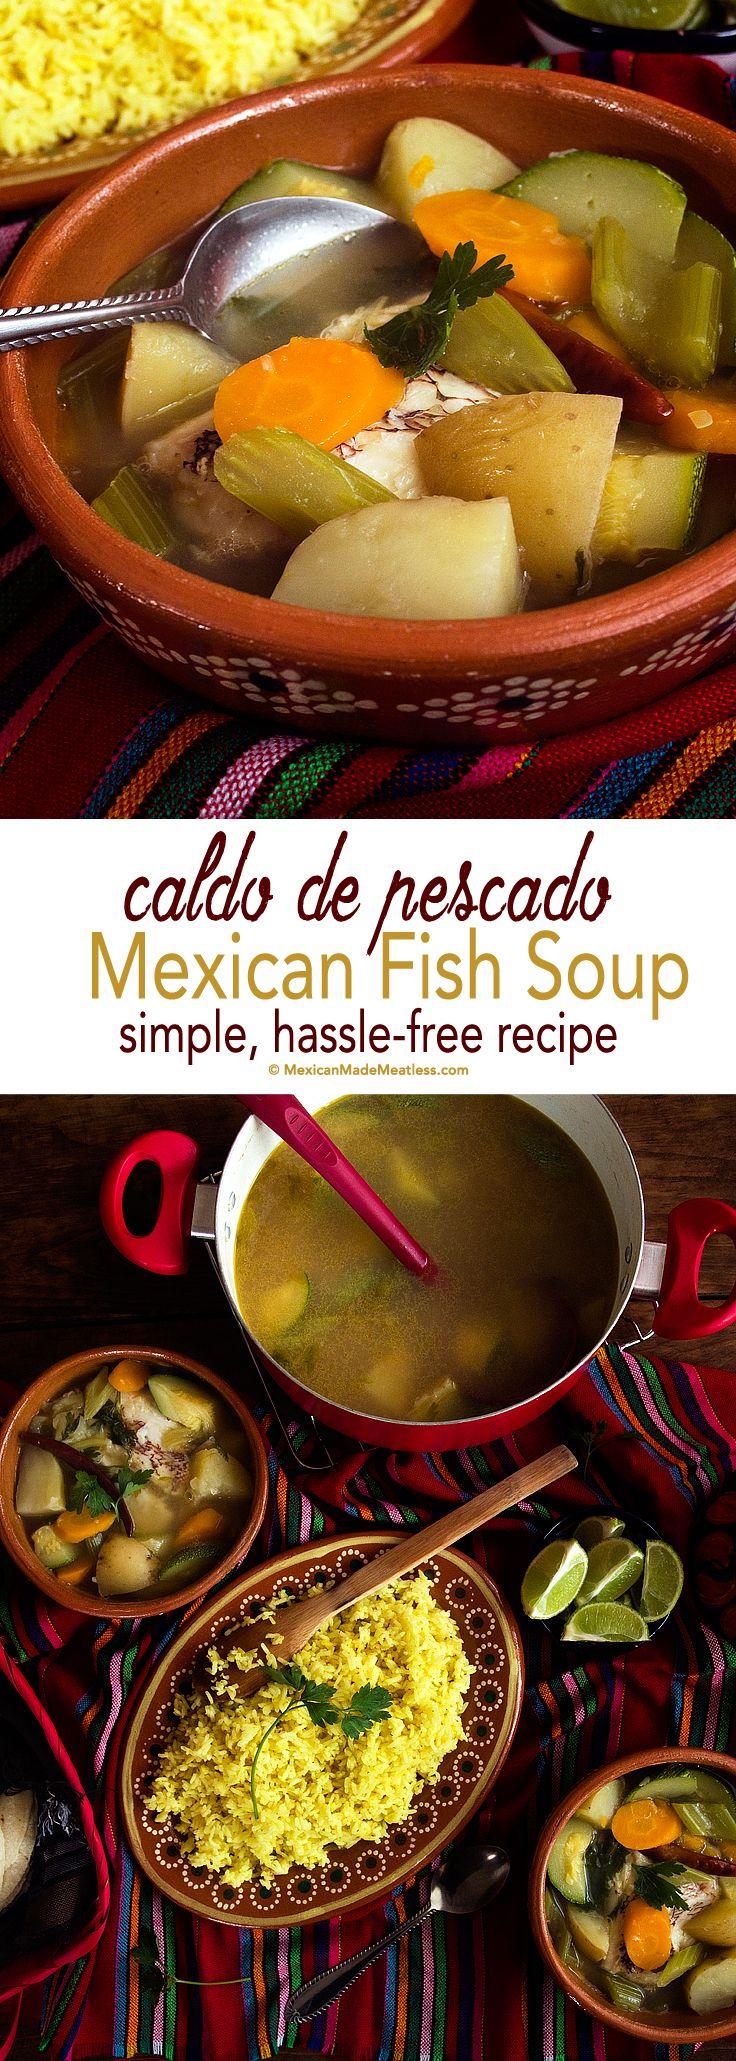 Simple, Hassle-Free #Mexican Fish Soup | Caldo De Pescado Muy Sencillo | #fish #soup #caldo #pescetarian #pescatarian #pescatarianism